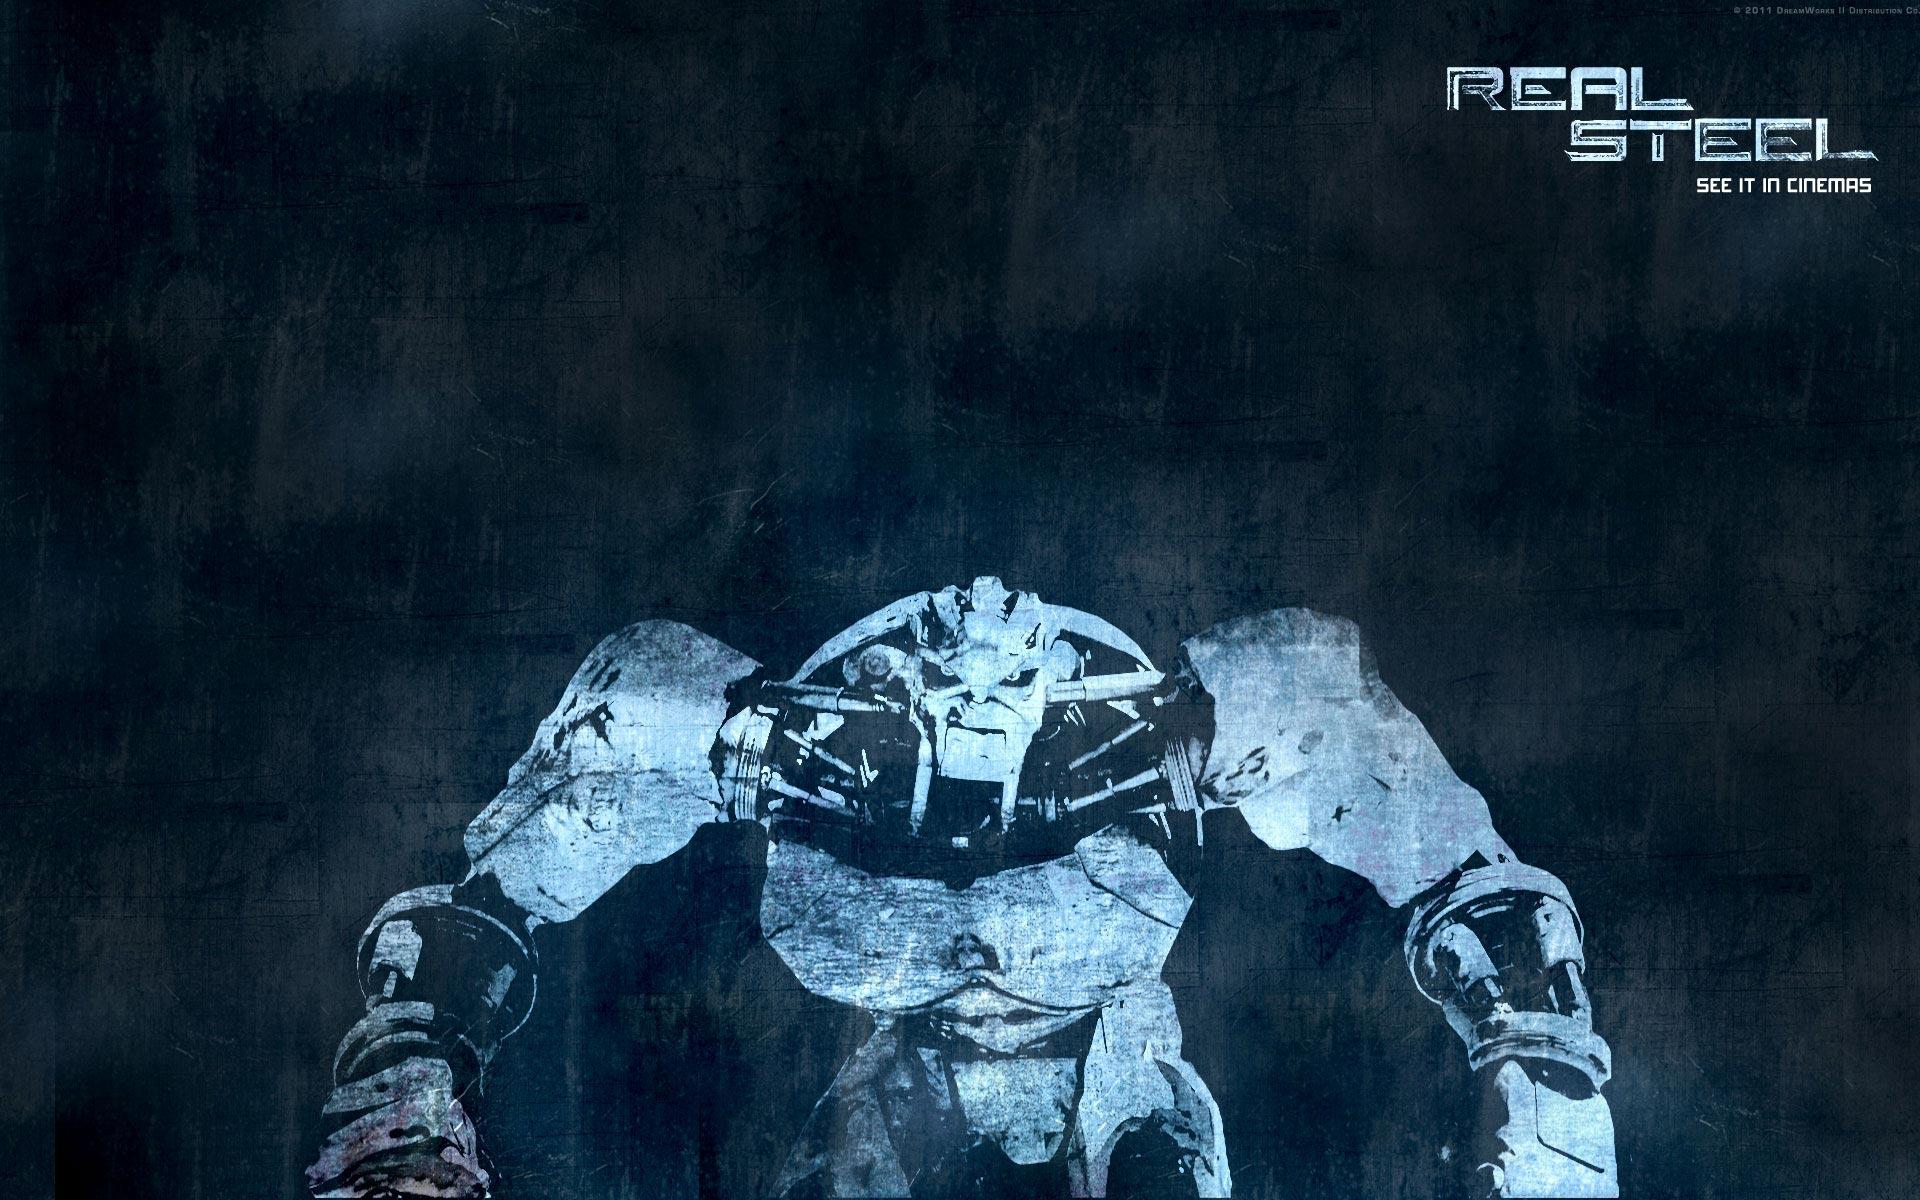 reel steel wallpaper - photo #25